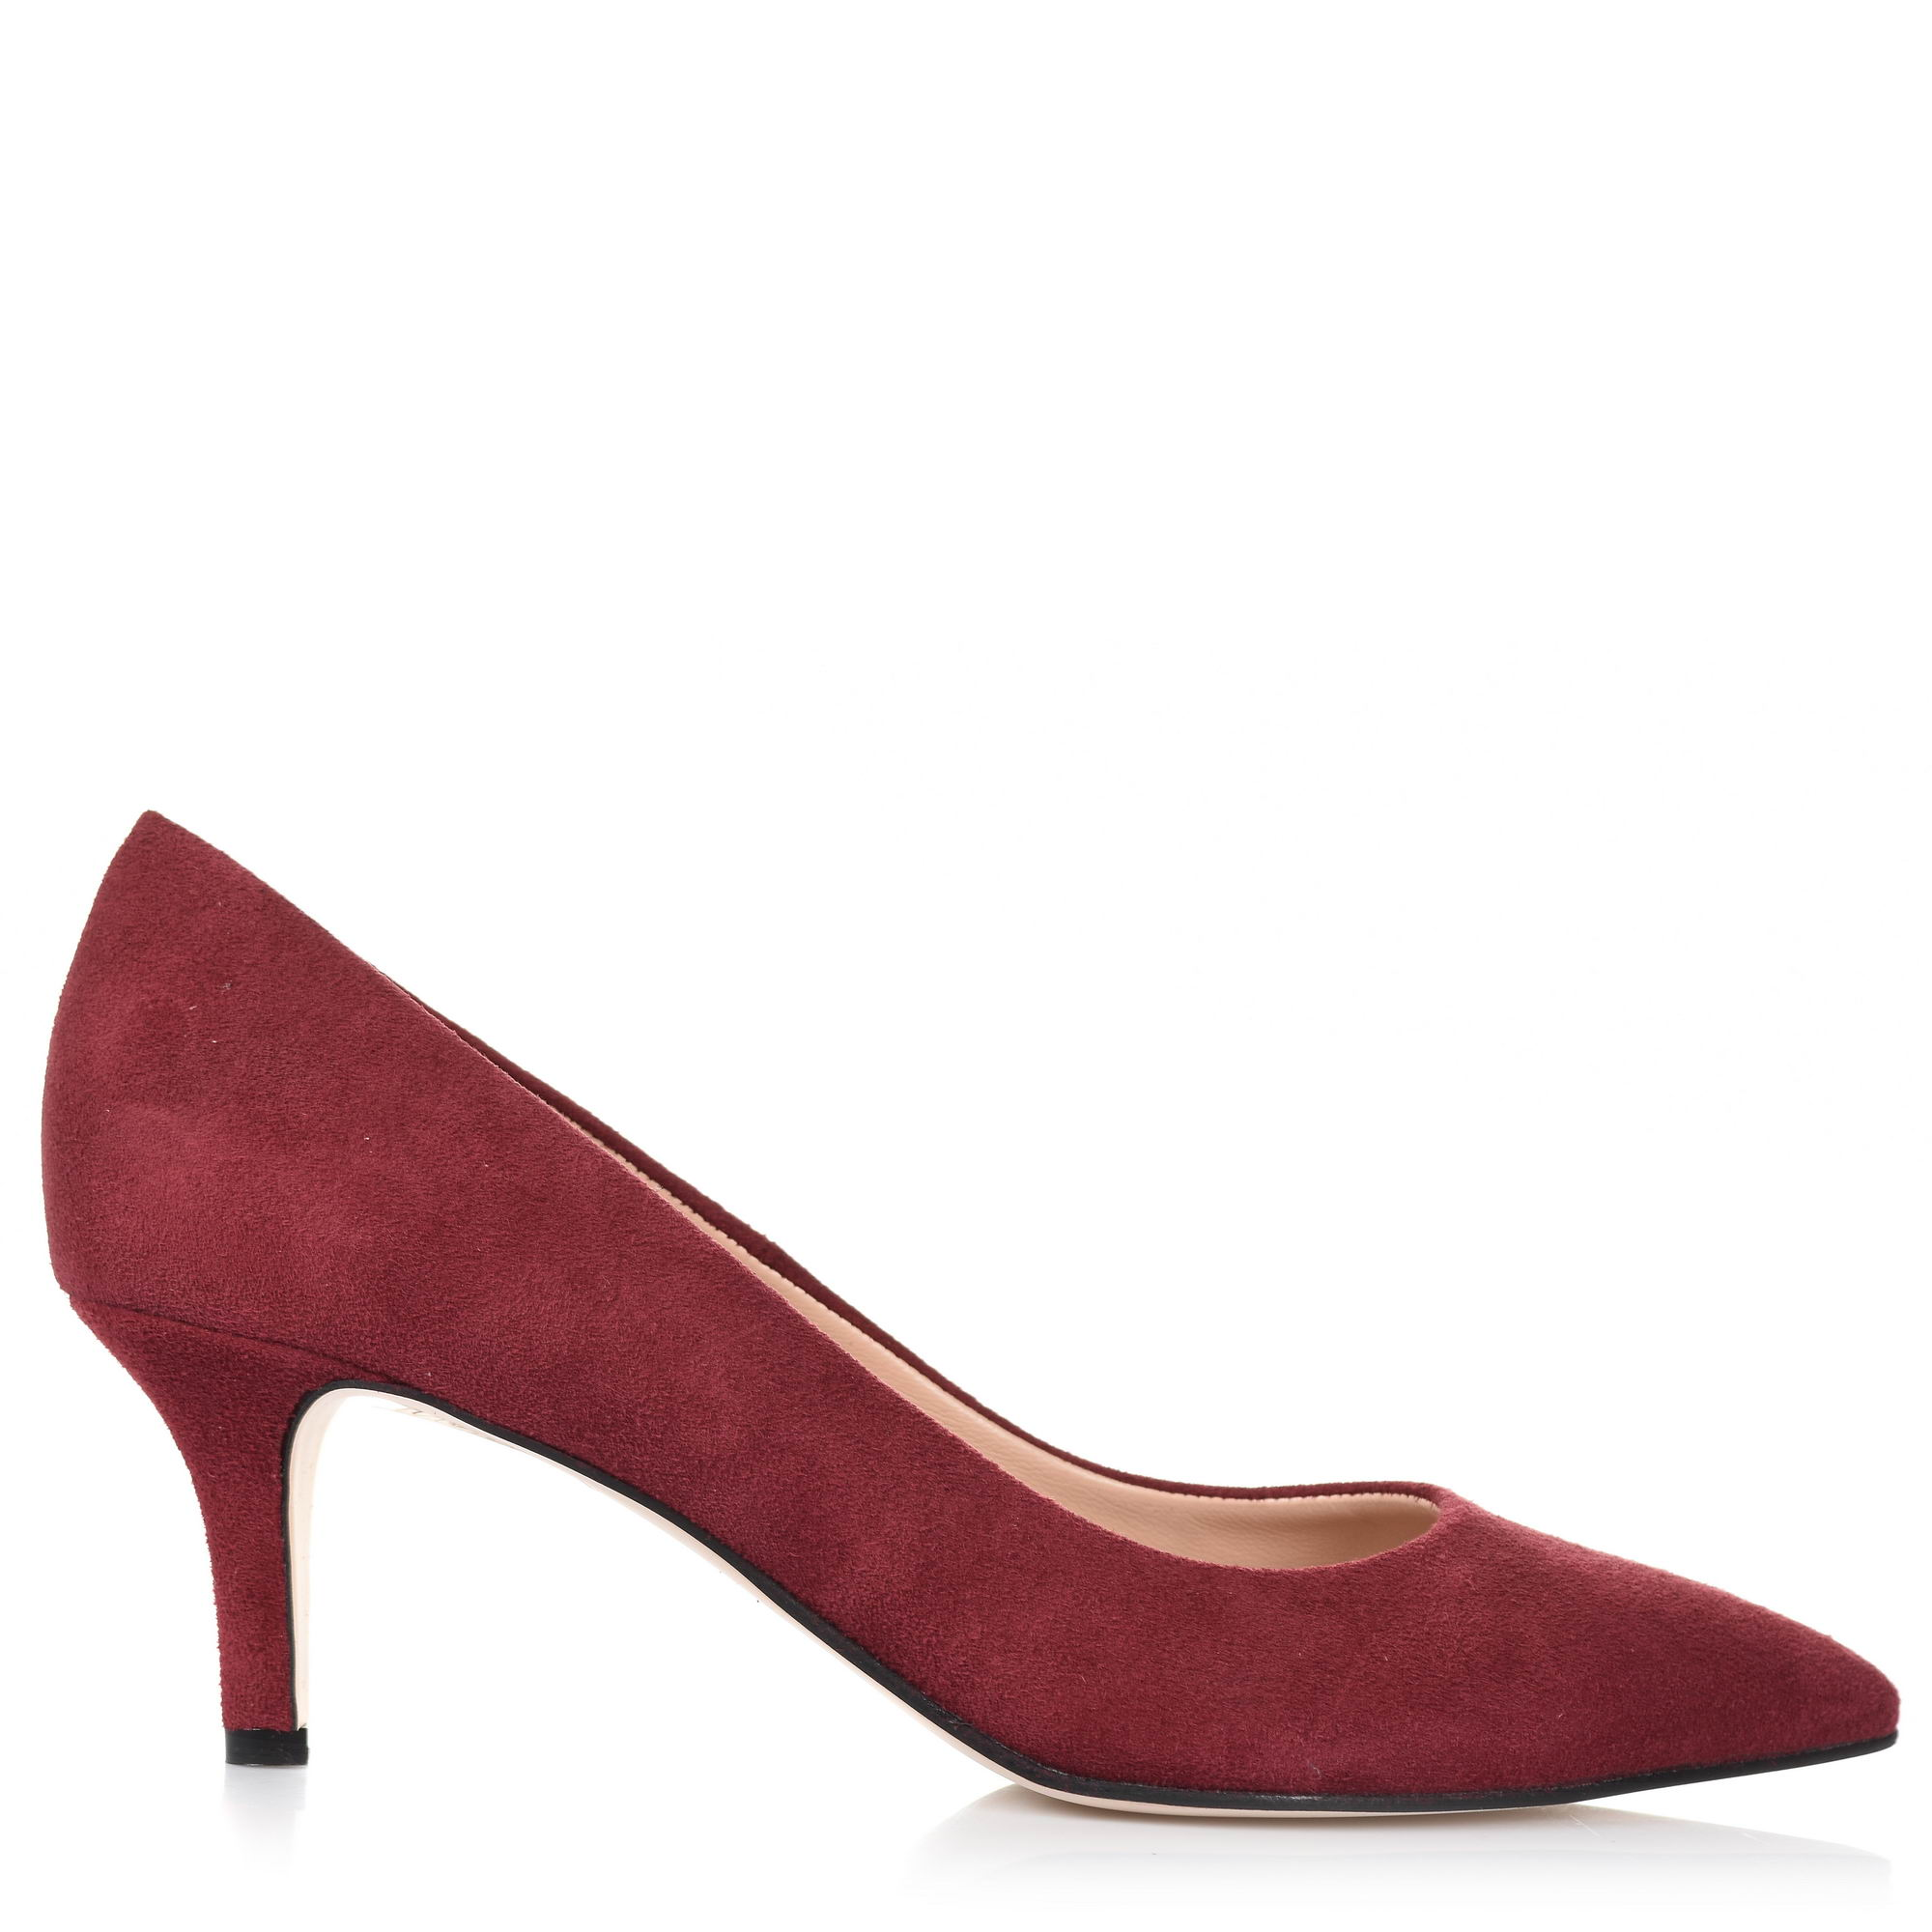 Suede Δερμάτινες Γόβες Mourtzi 55/55600 γυναικα   γυναικείο παπούτσι